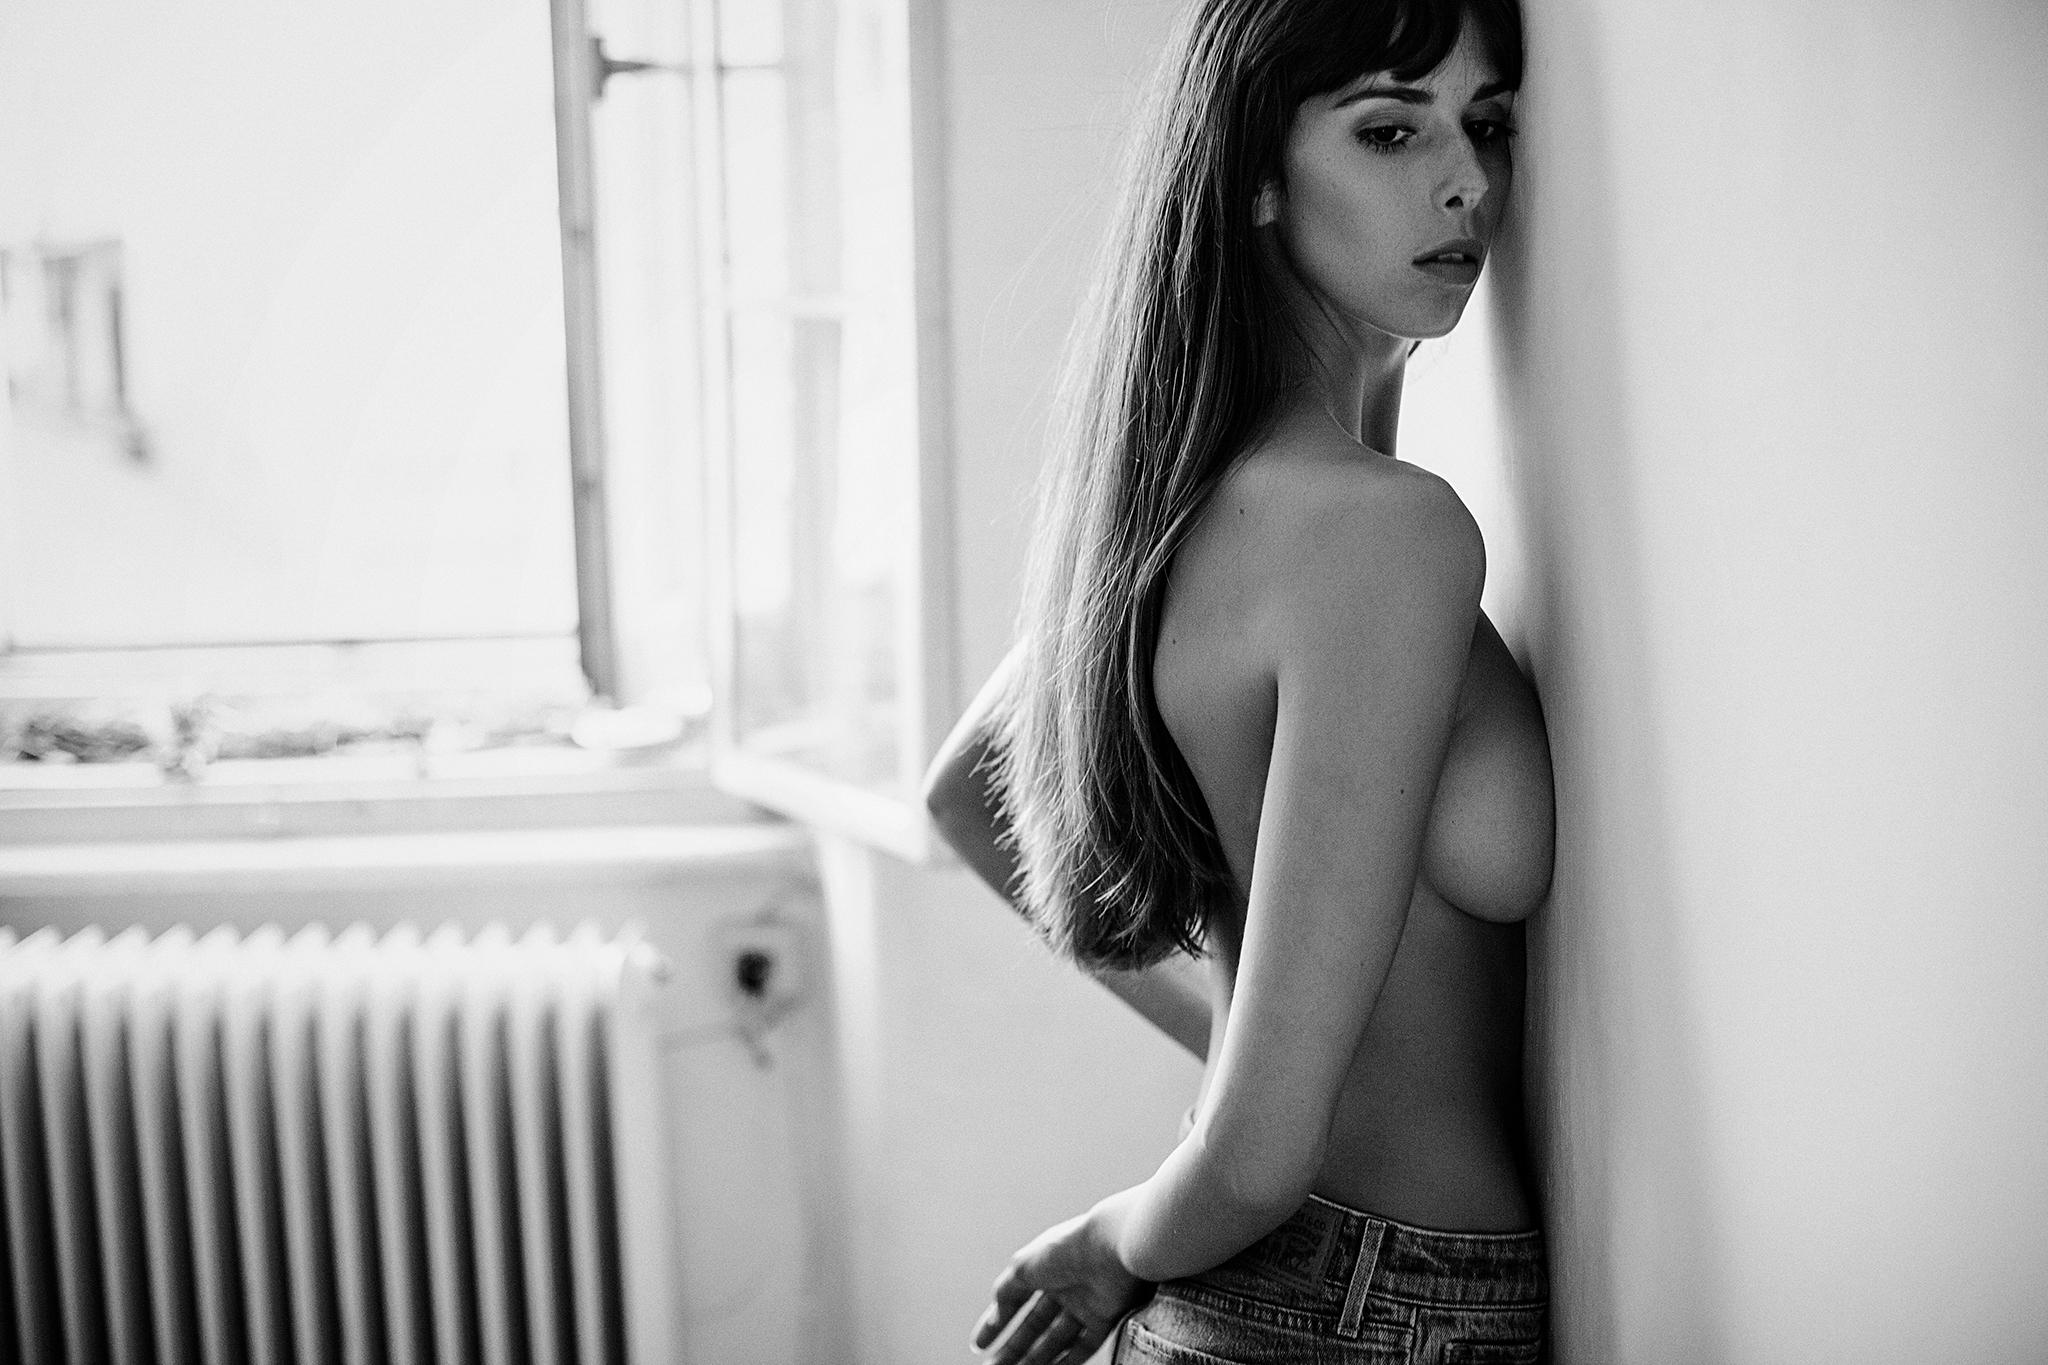 Anna_5100_125XPpro